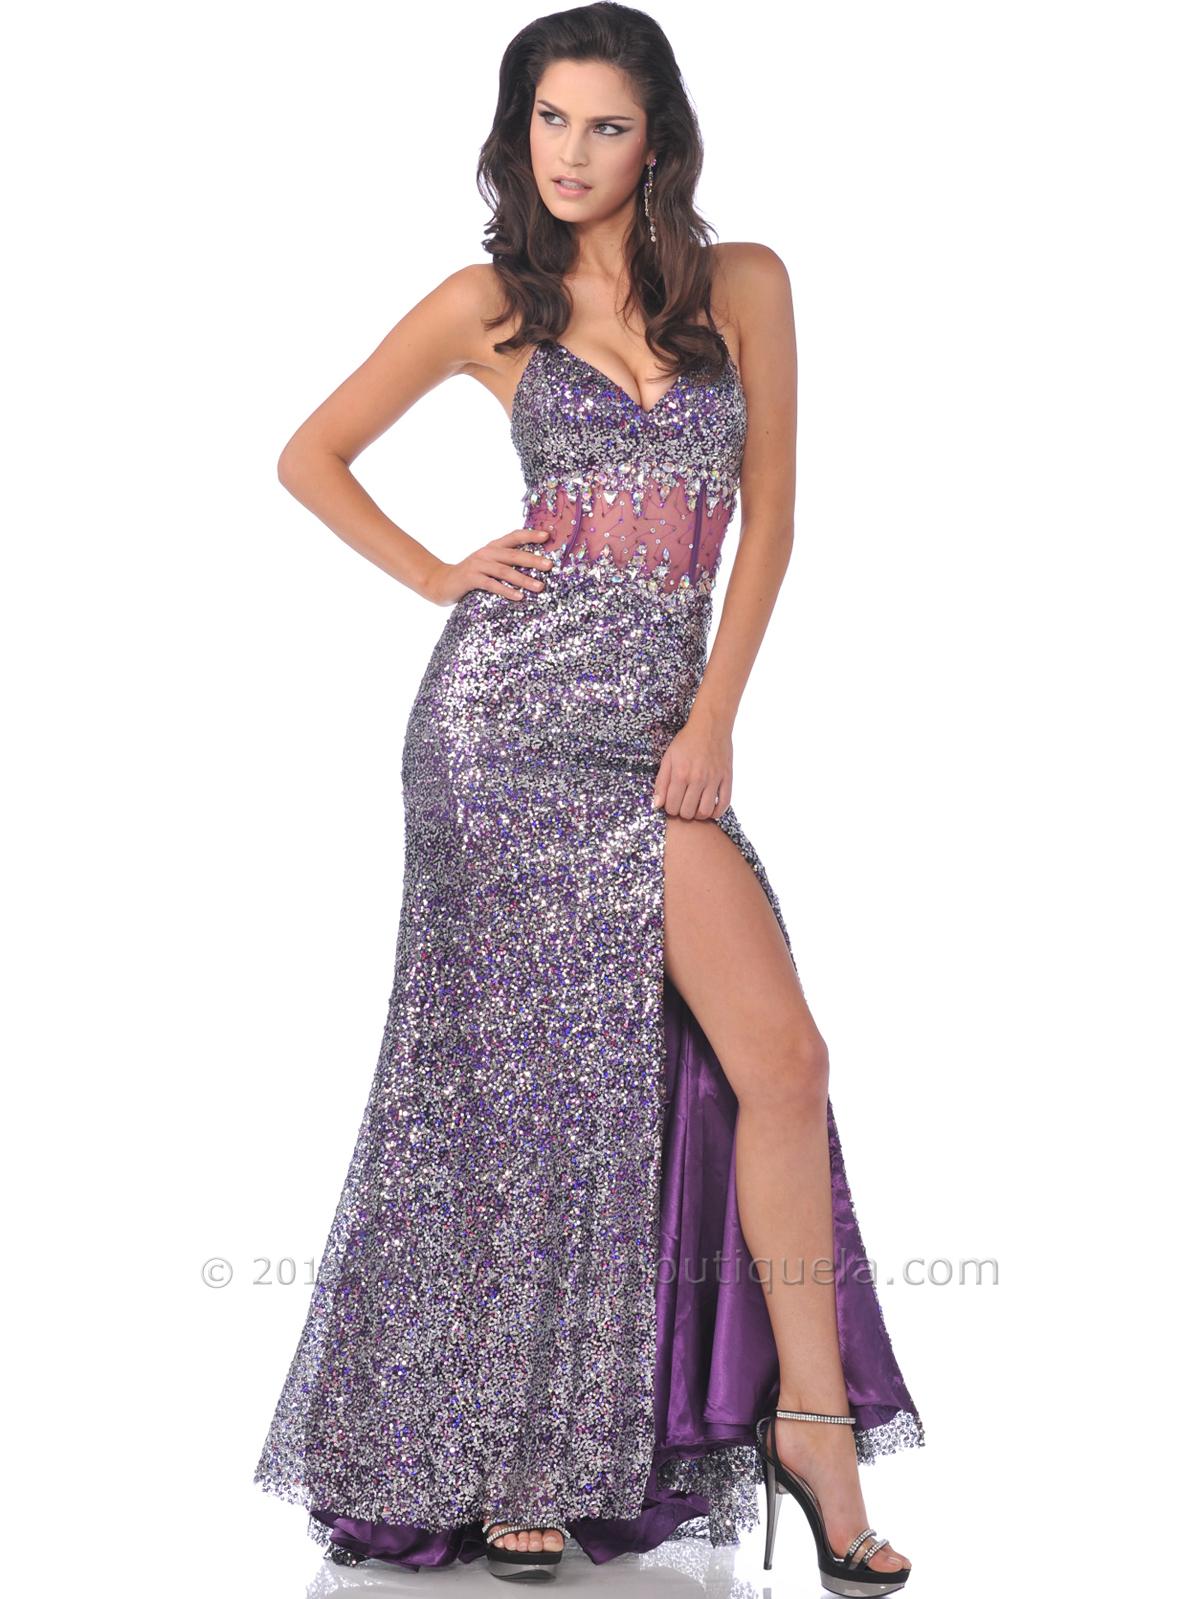 Zara Bridal Prom Dresses 114